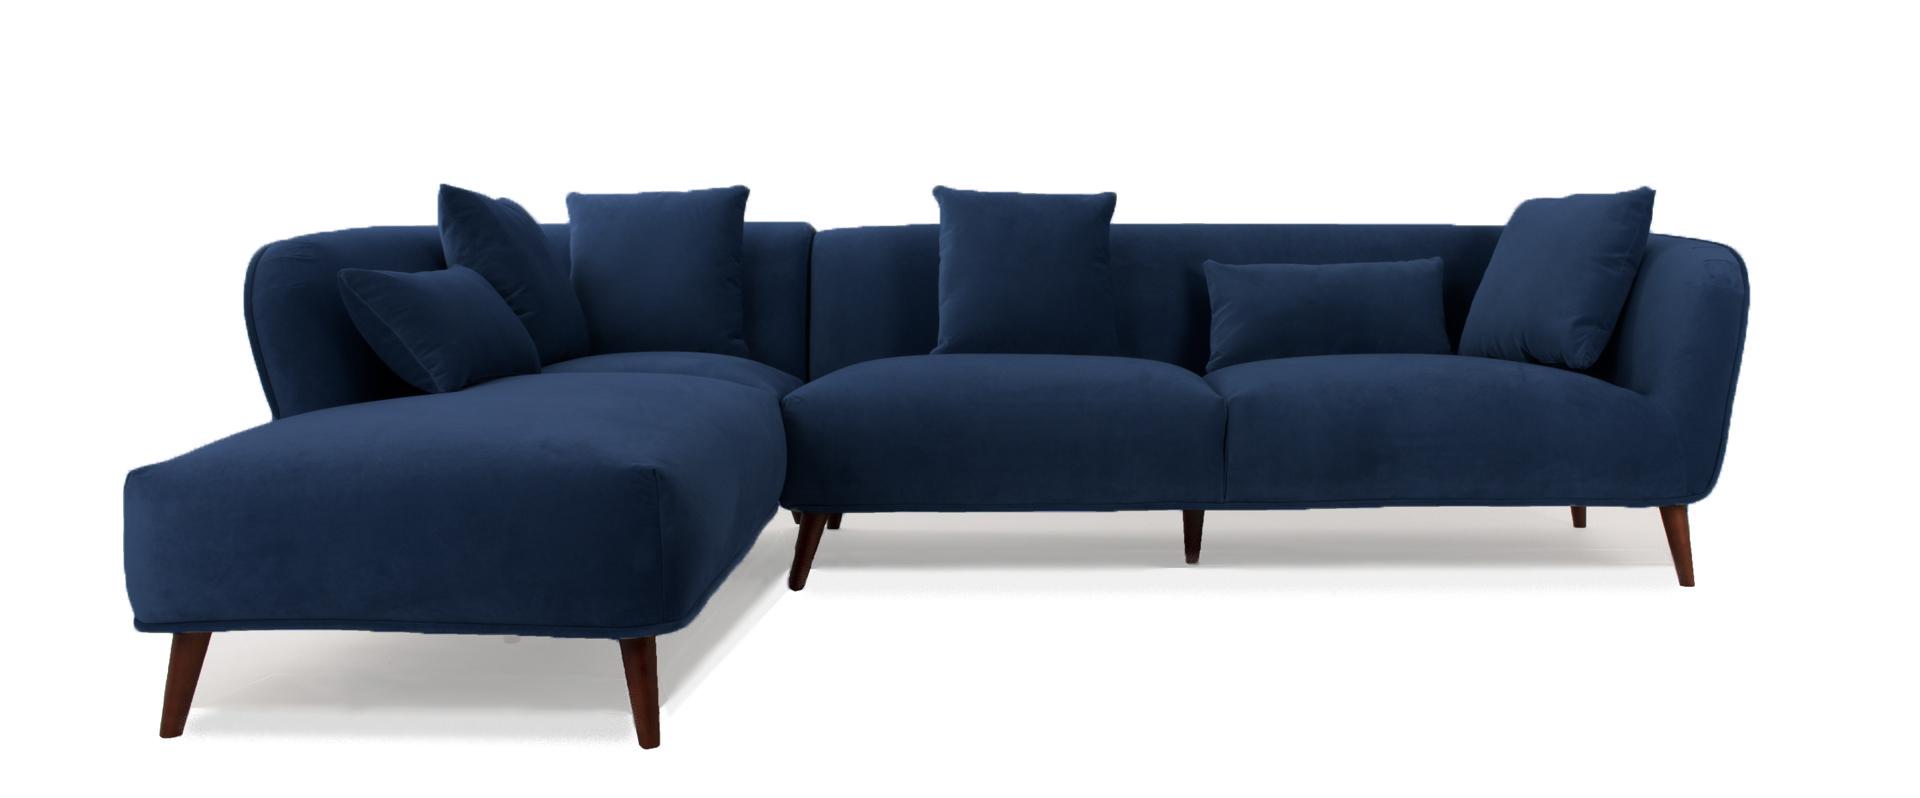 Fantastic Ez Living Interiors Furniture Interior Superstores Ireland Andrewgaddart Wooden Chair Designs For Living Room Andrewgaddartcom